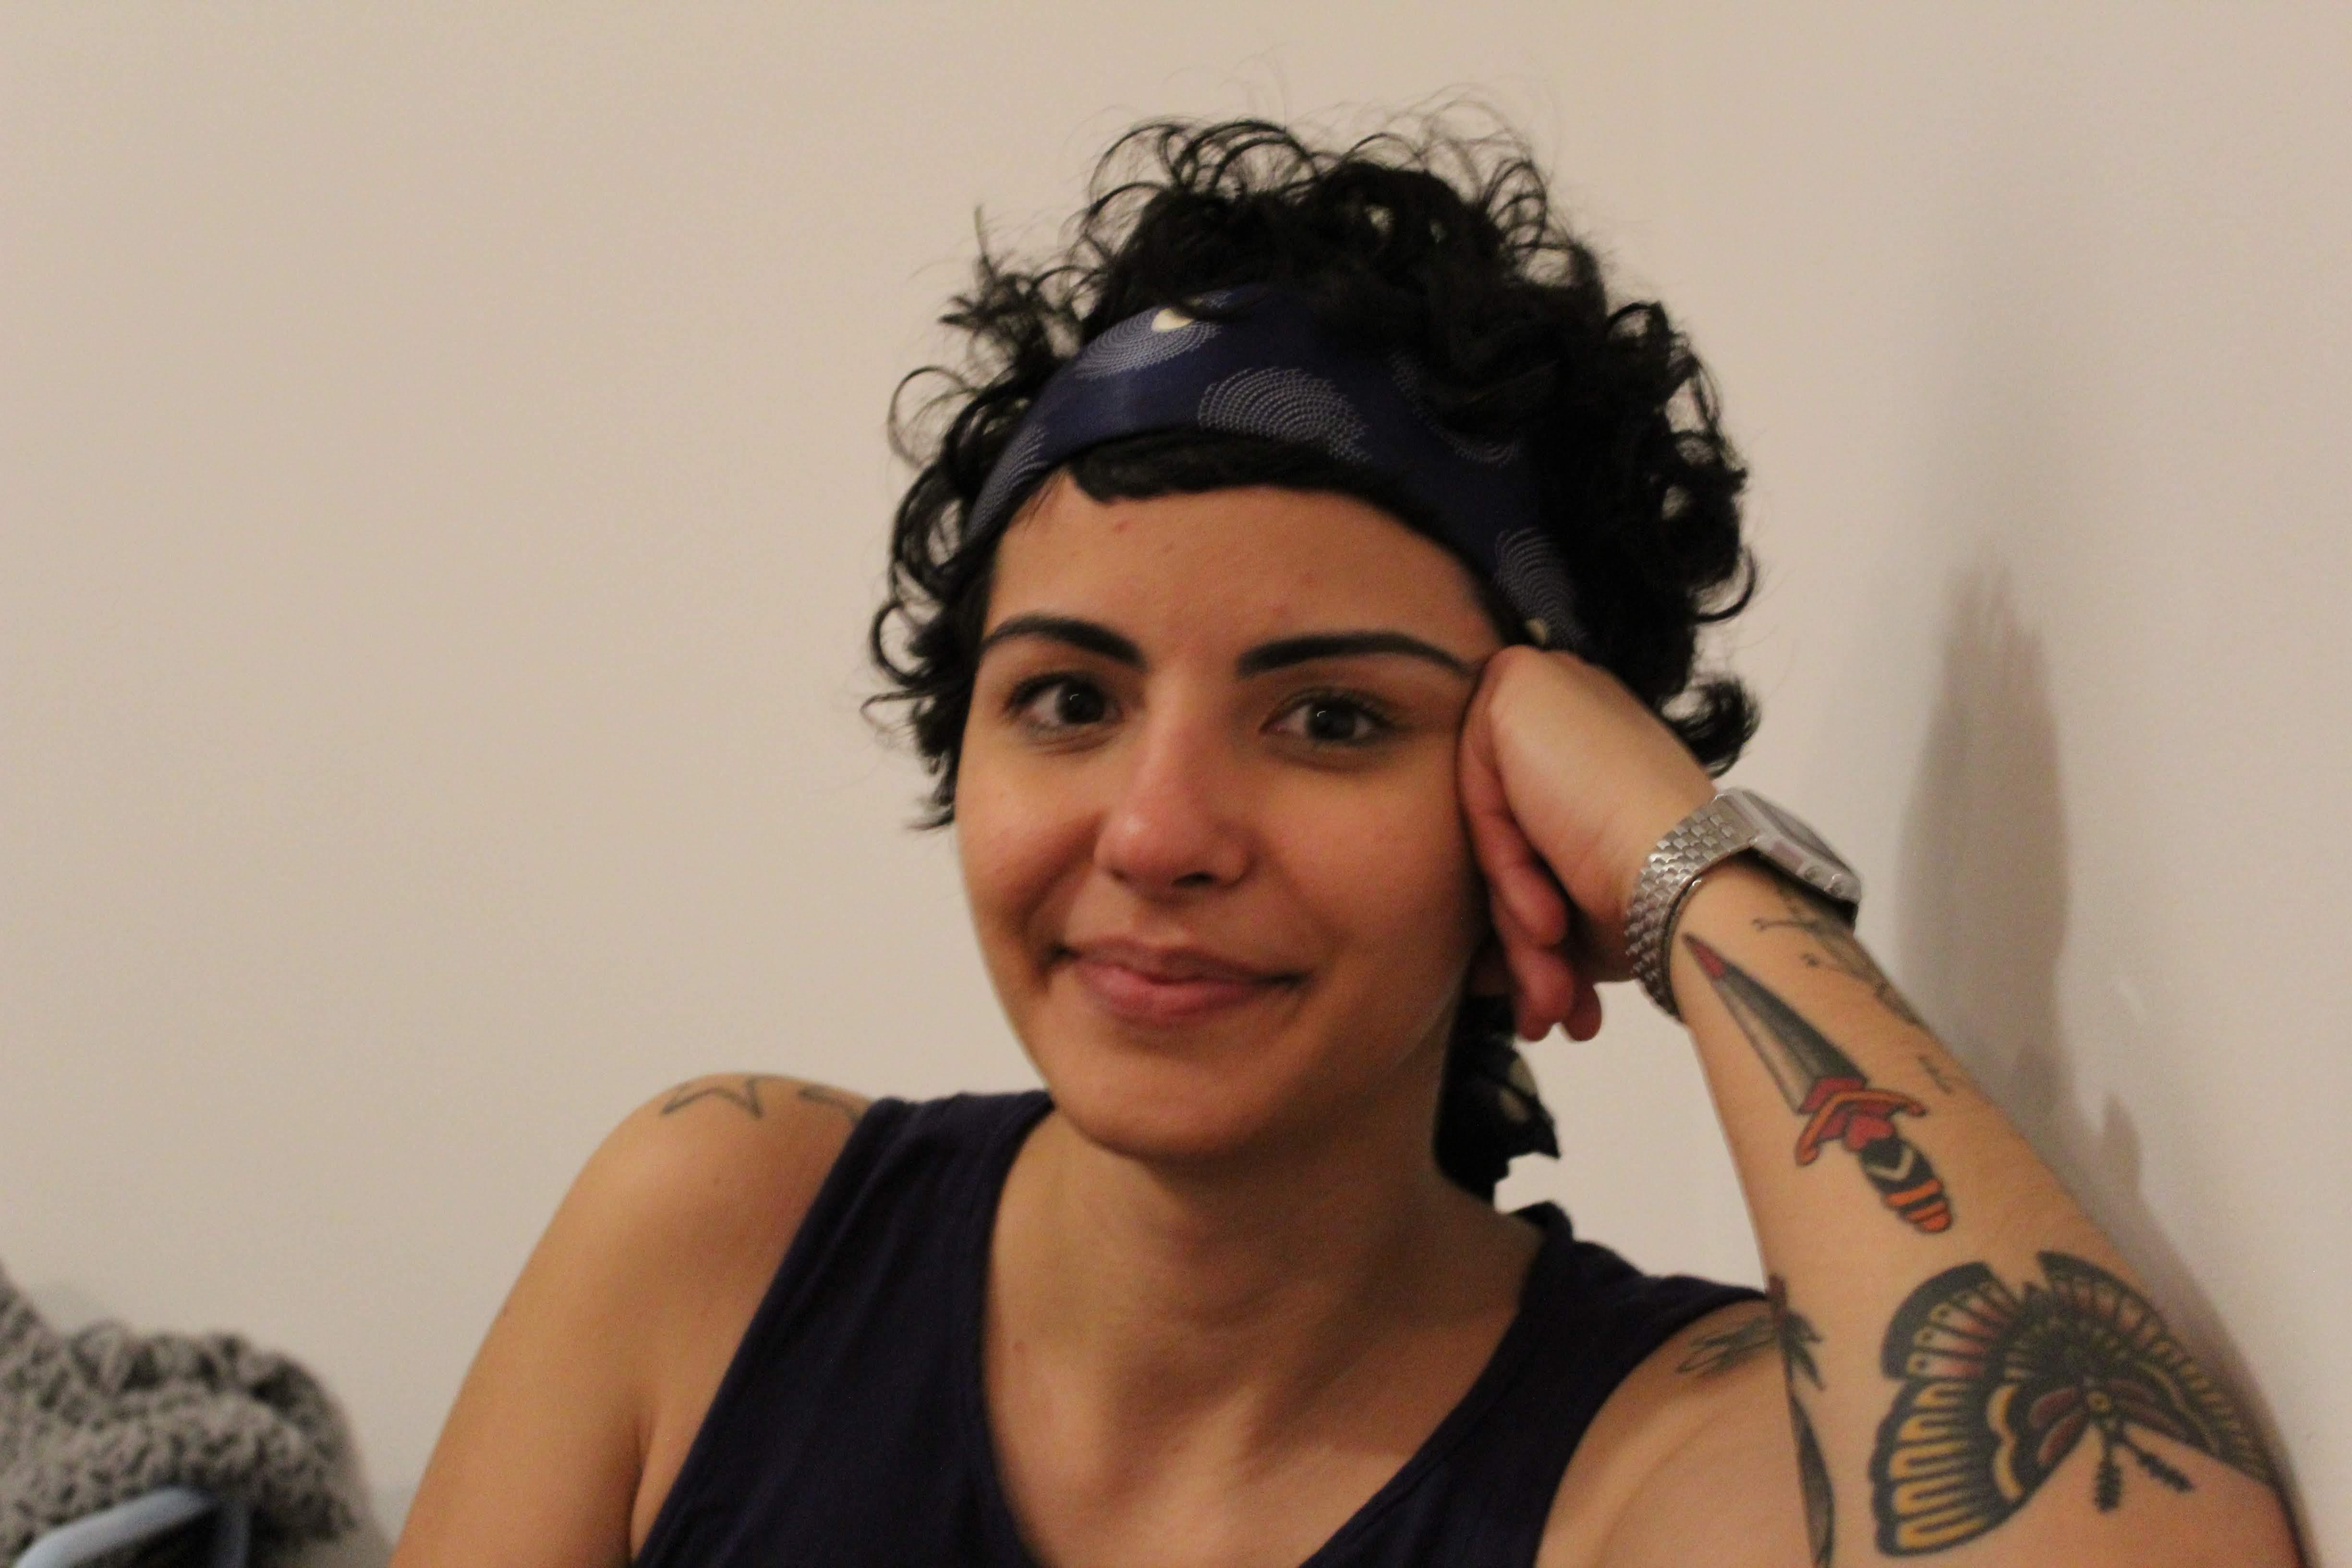 Editora da Companhia das Letras é selecionada para o fellowship do Festival de Literatura de Istambul